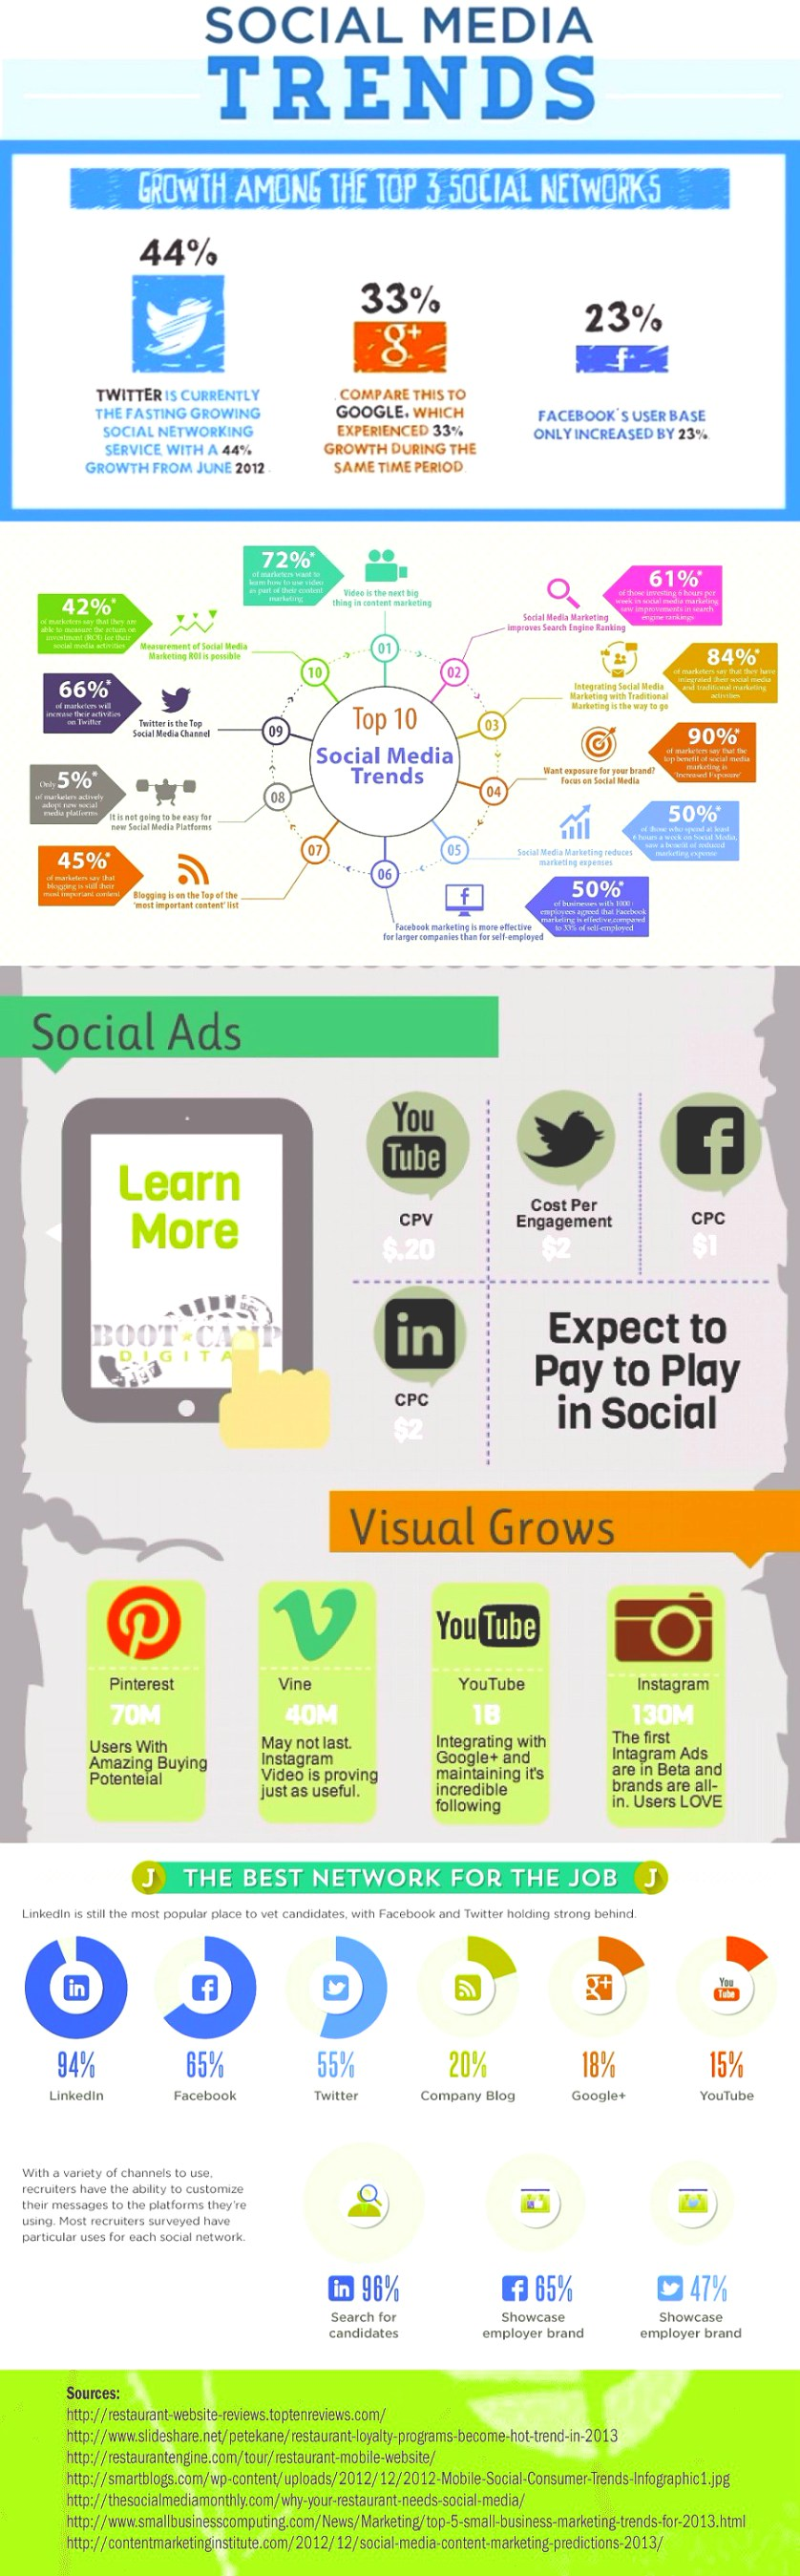 Social media trends 2016 - Infographic